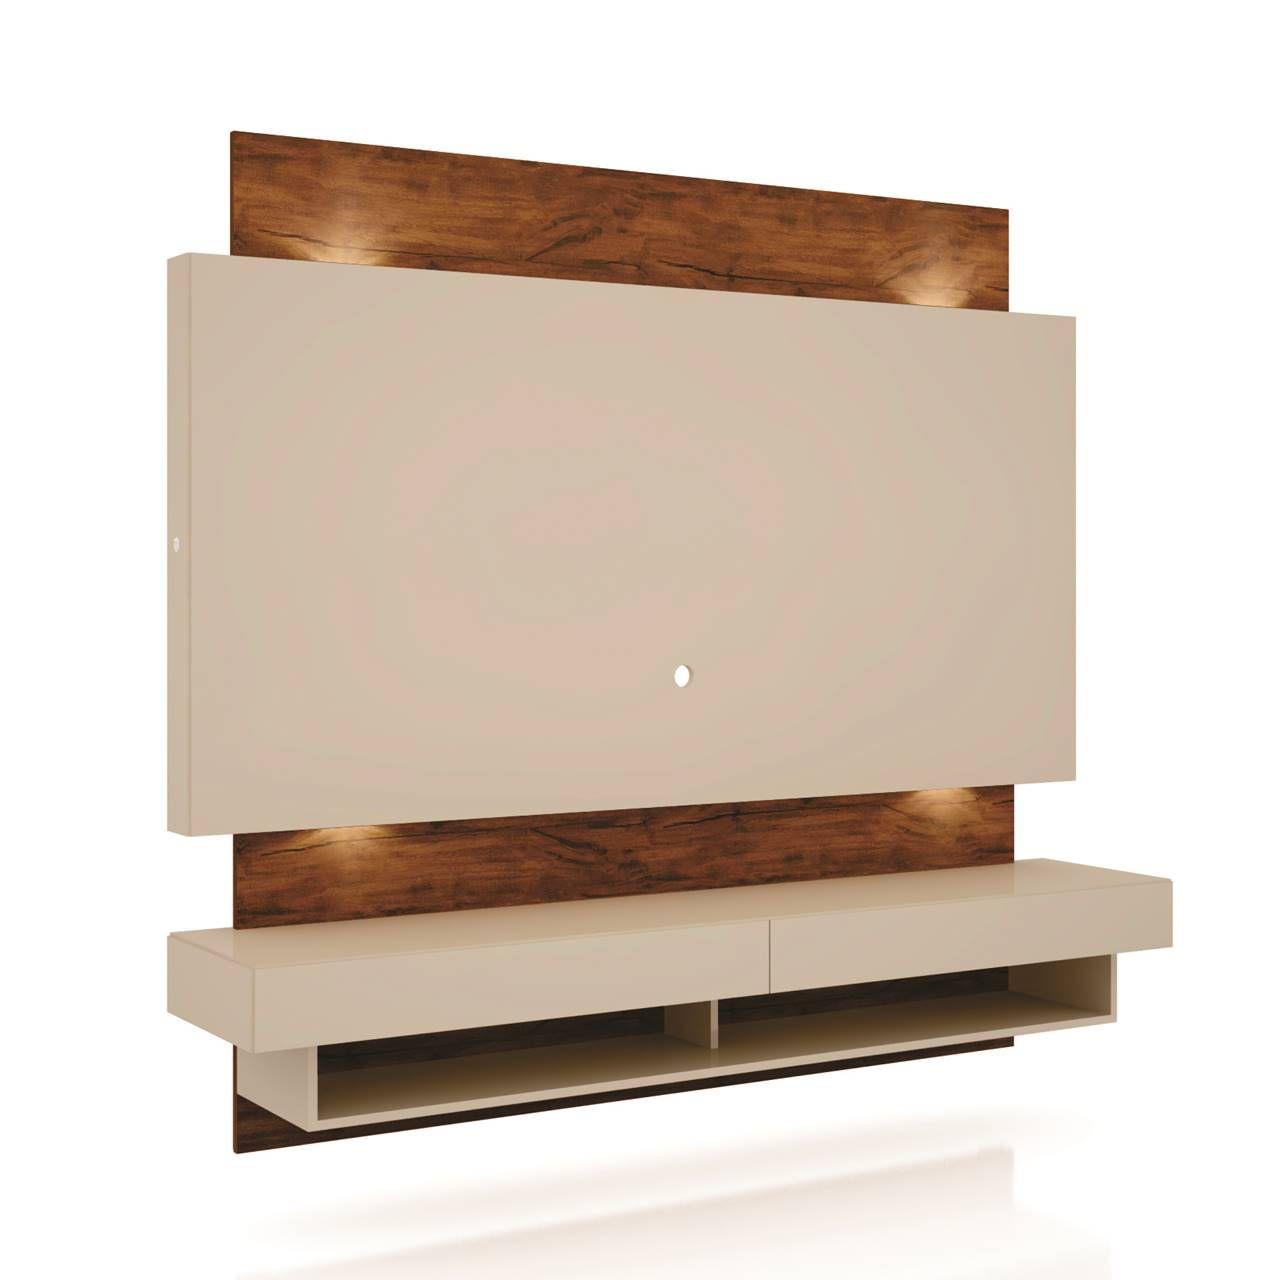 "Painel Home Suspenso p/ TV até 65"" com LED TB115L Dalla Costa Offwhite/Nobre"